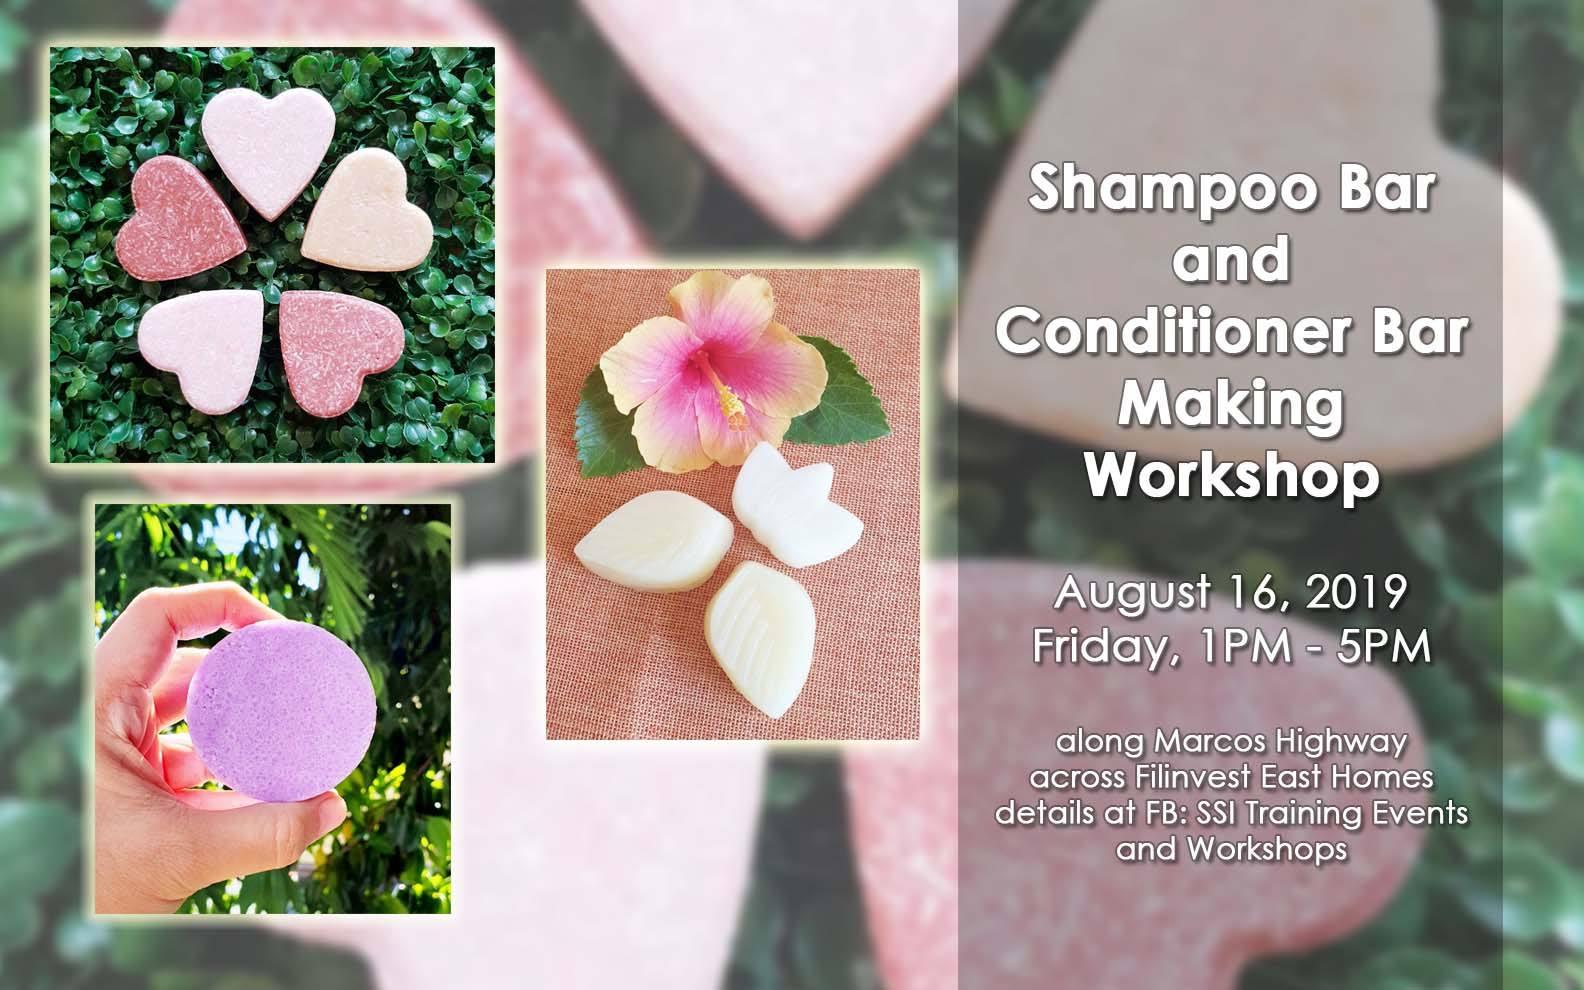 Shampoo Bar and Conditioner Bar Making Workshop